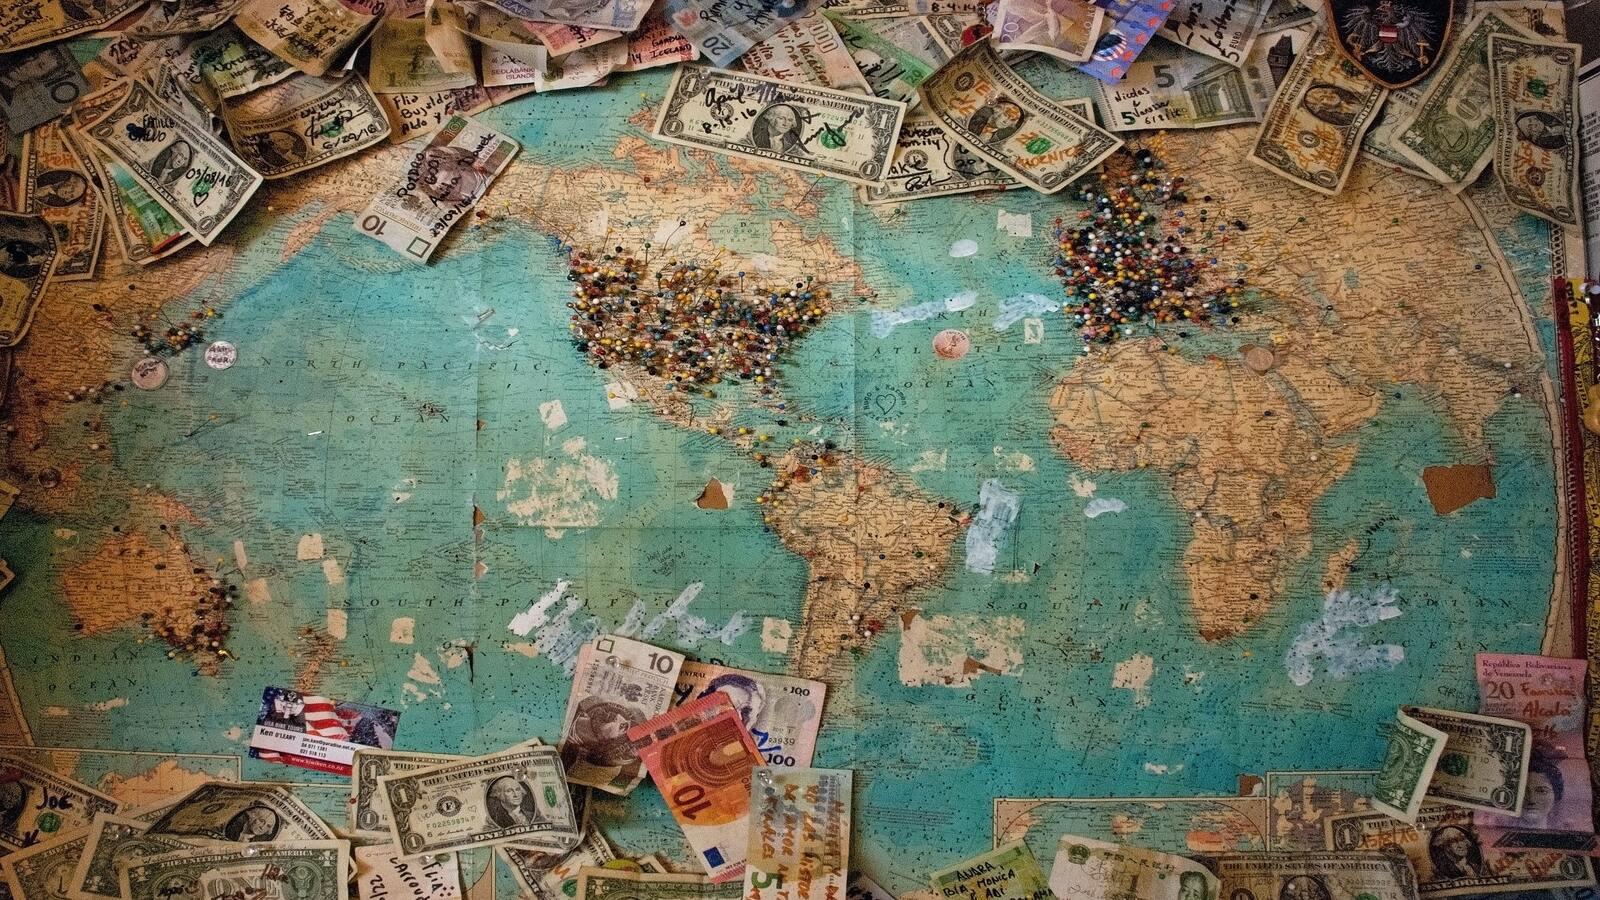 https://blog.currencyfair.com/hubfs/christine-roy-ir5MHI6rPg0-unsplash%201-1.jpg